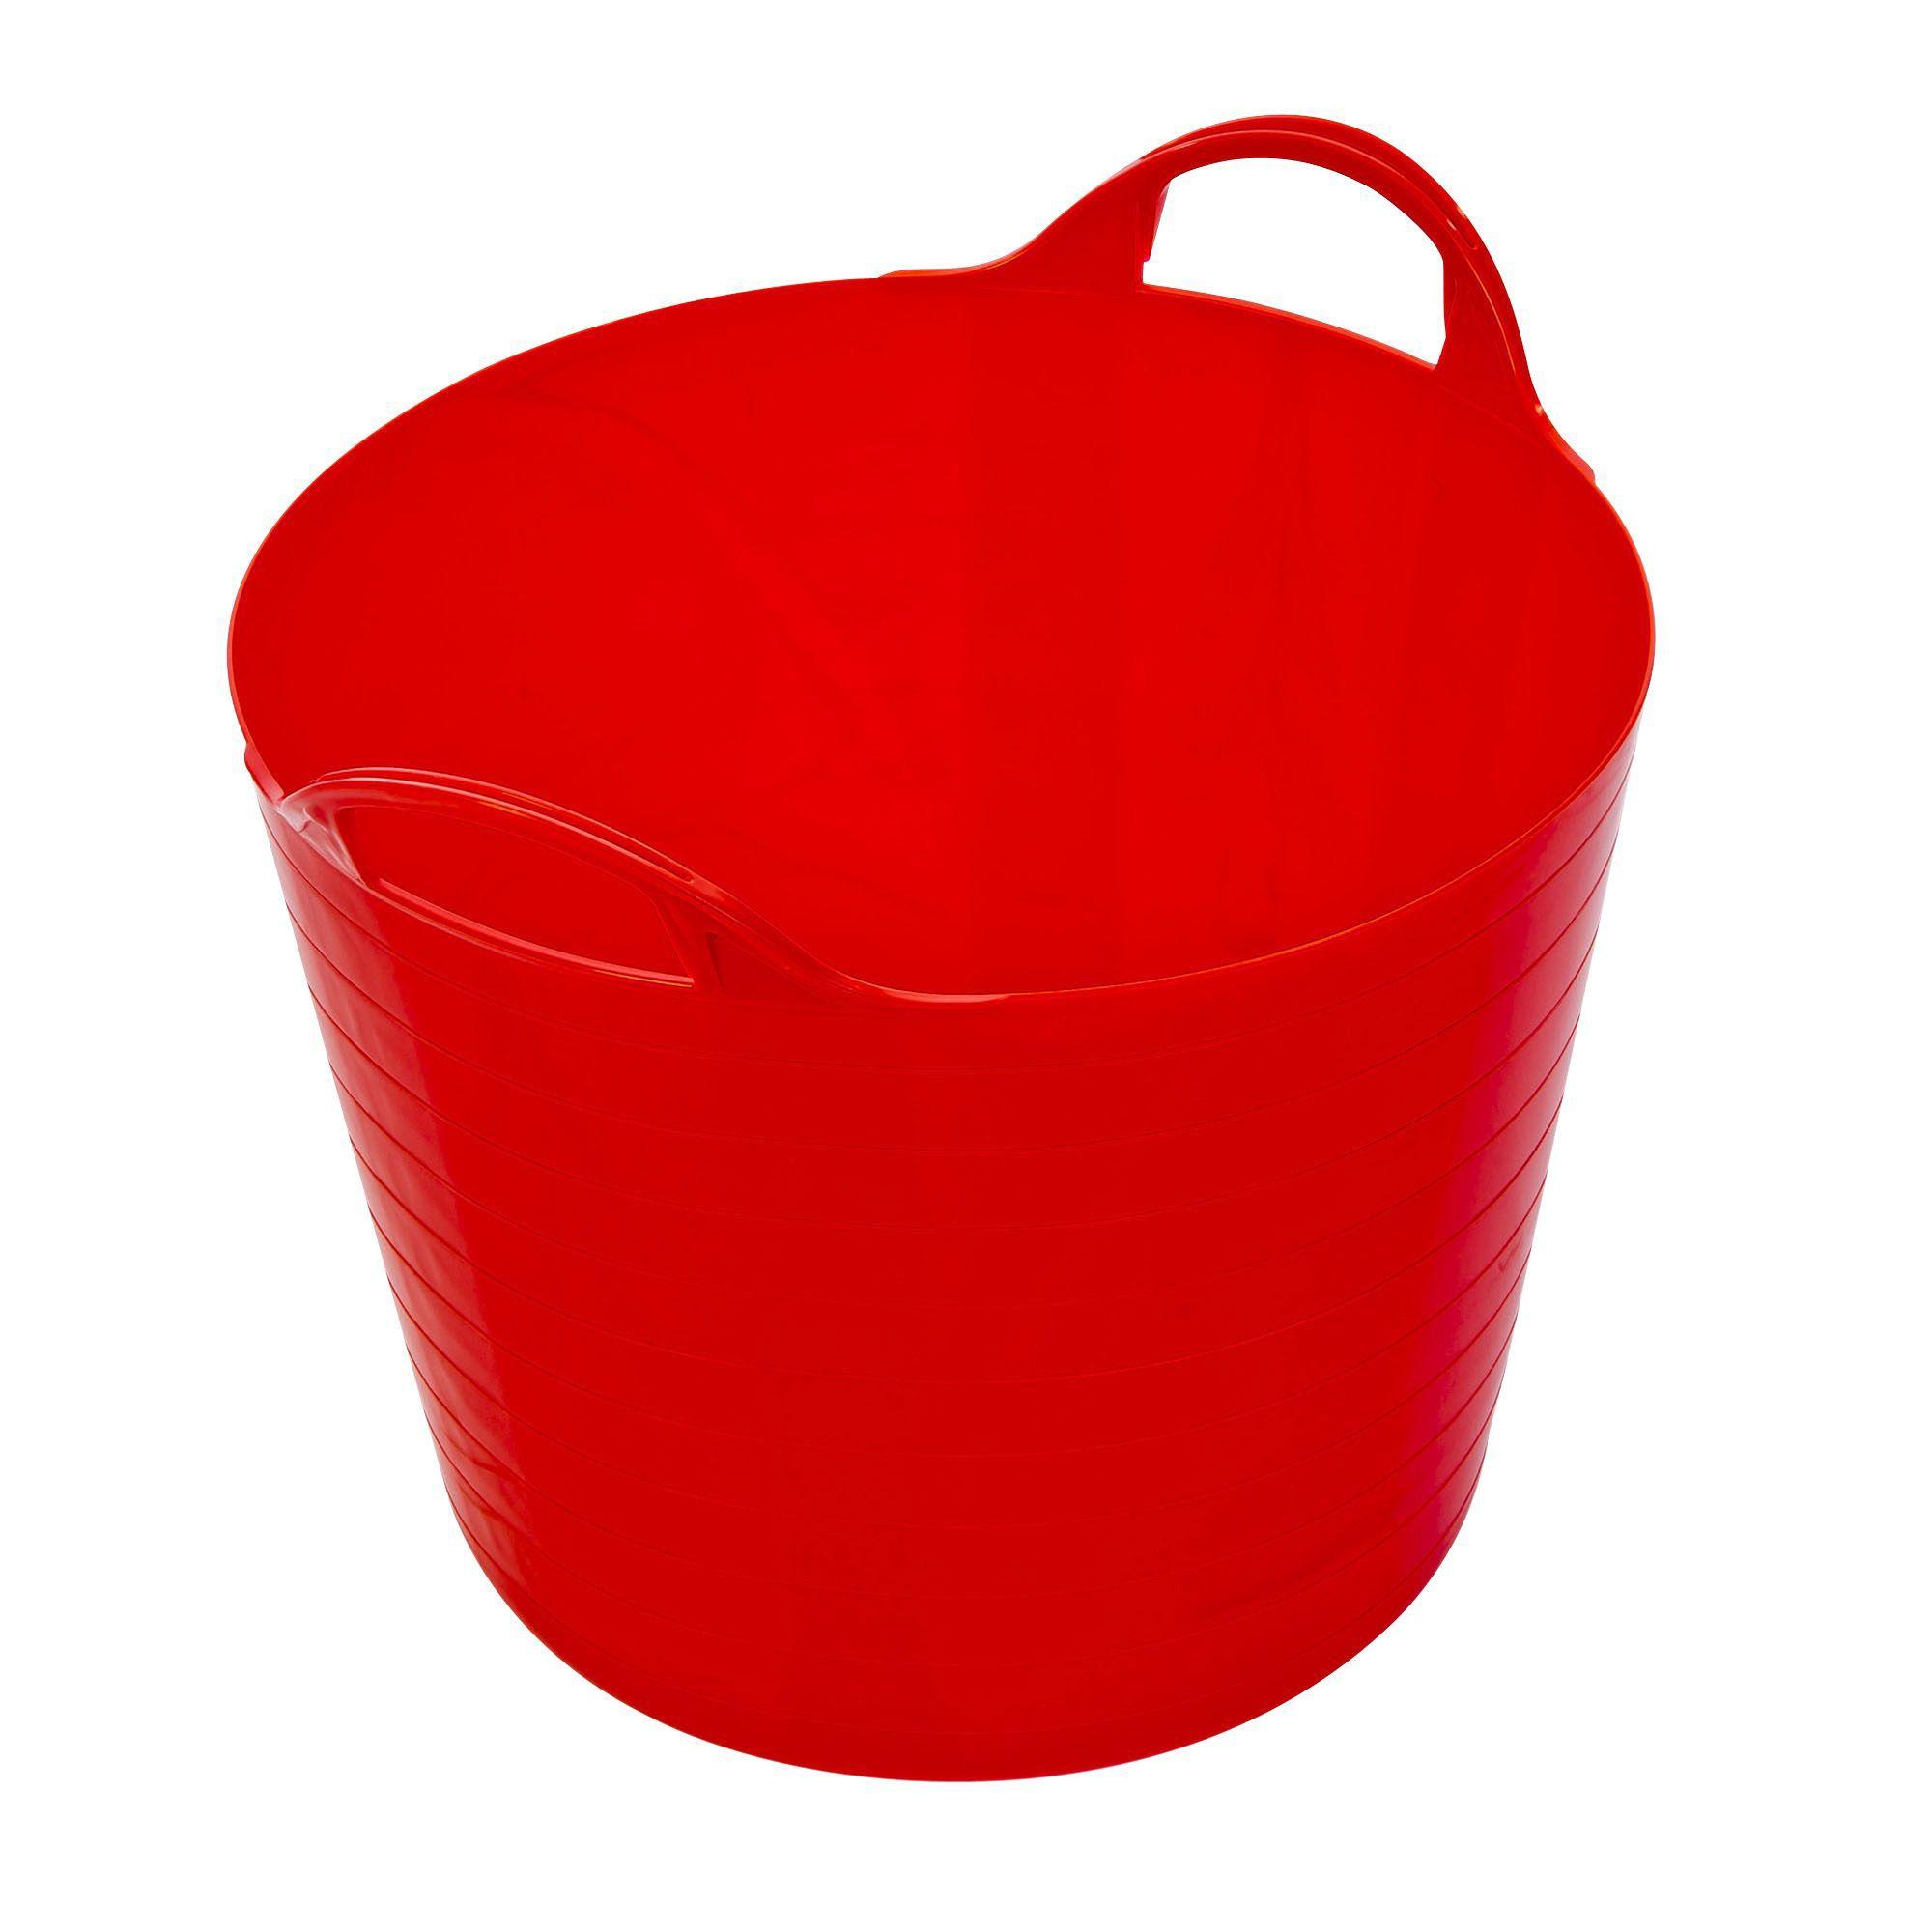 tub online toy plastic pit storage laundry crafts sand kitncaboodle kids basket homewares